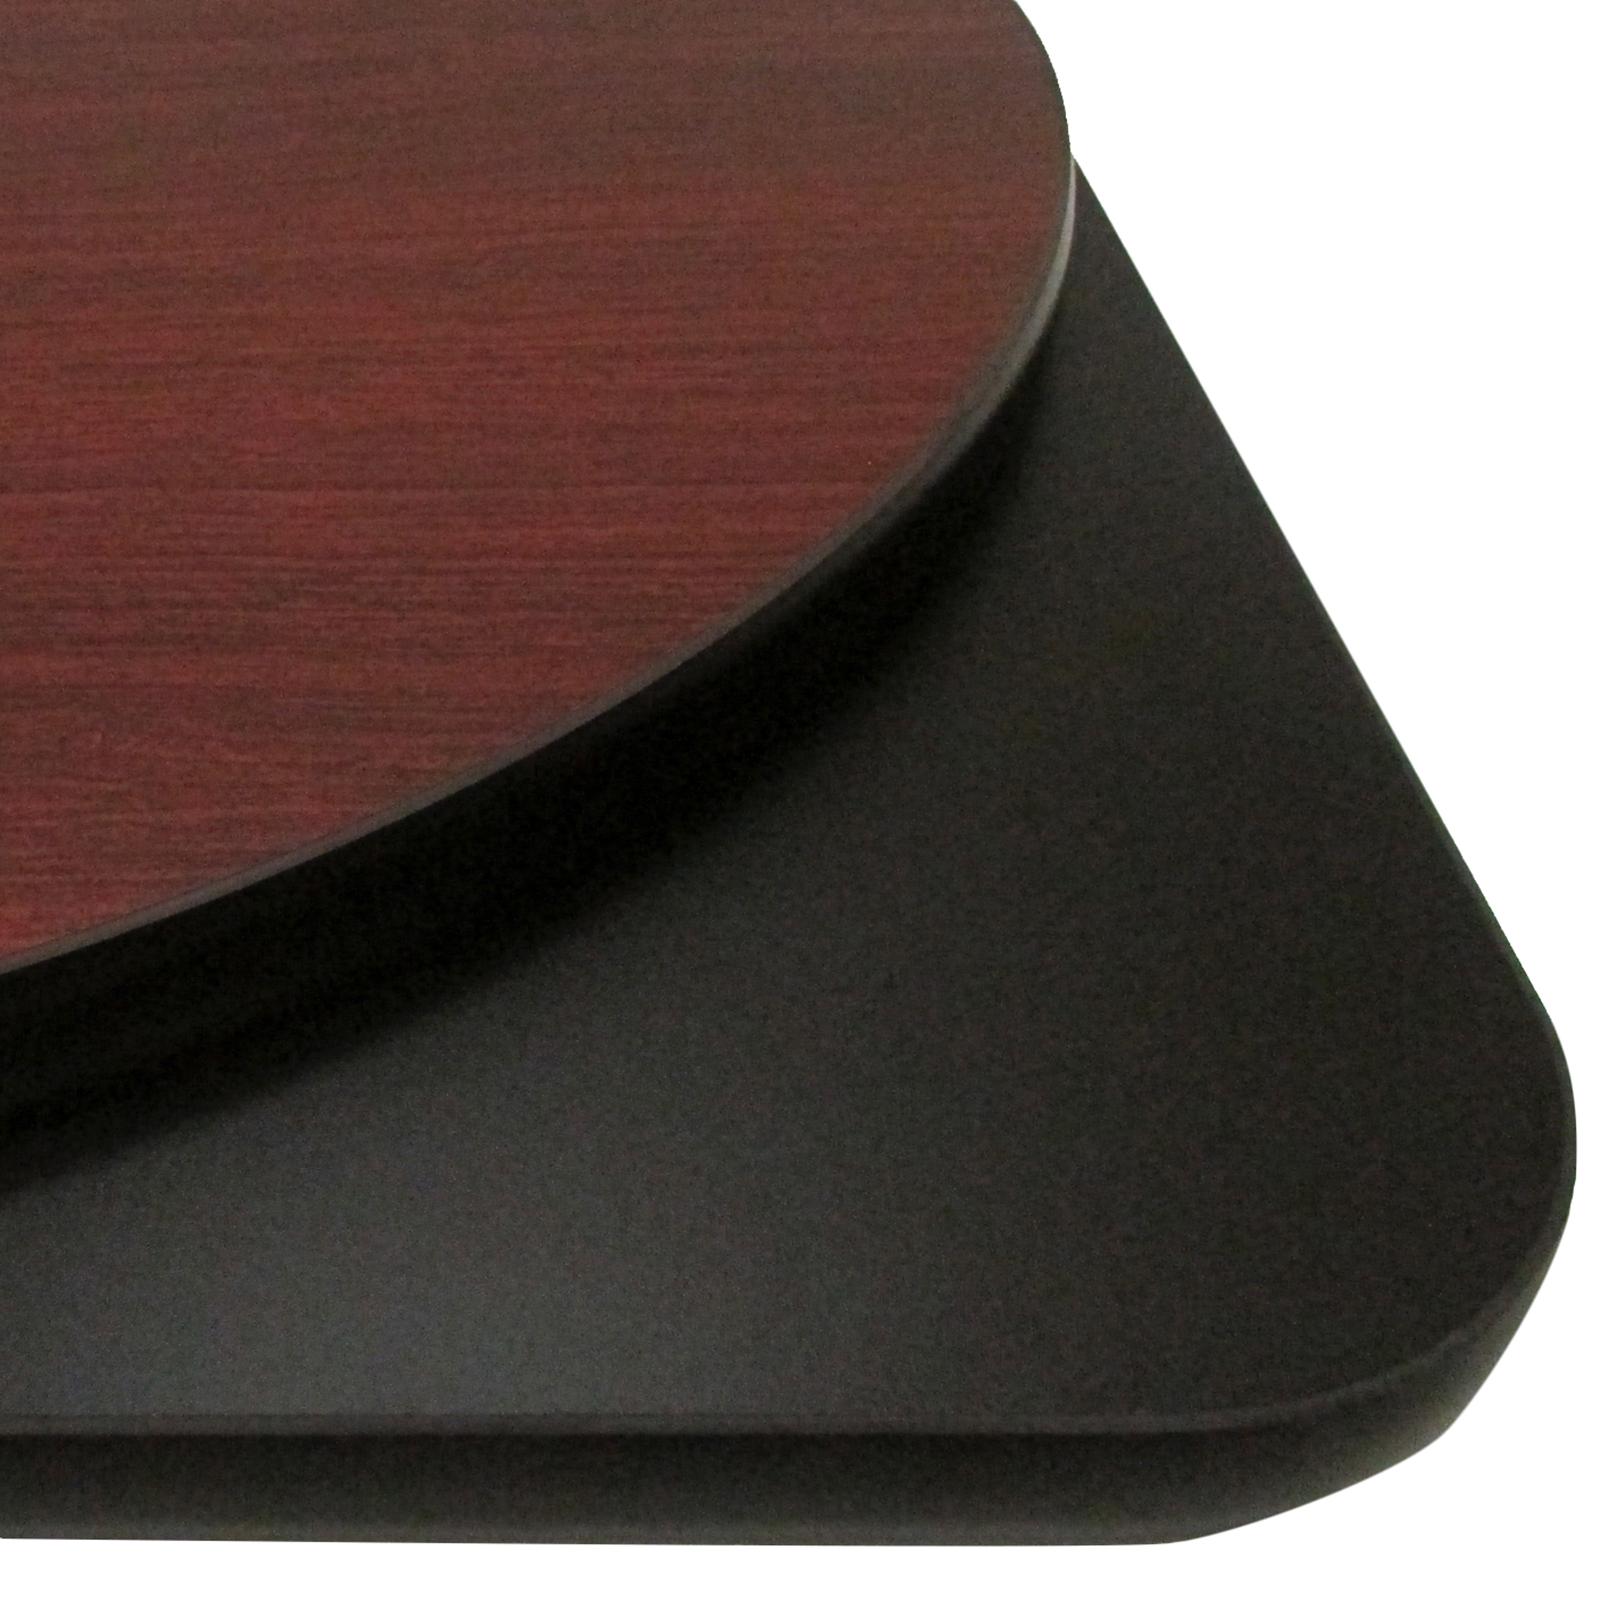 Klinger's Trading MB3636 table top, laminate